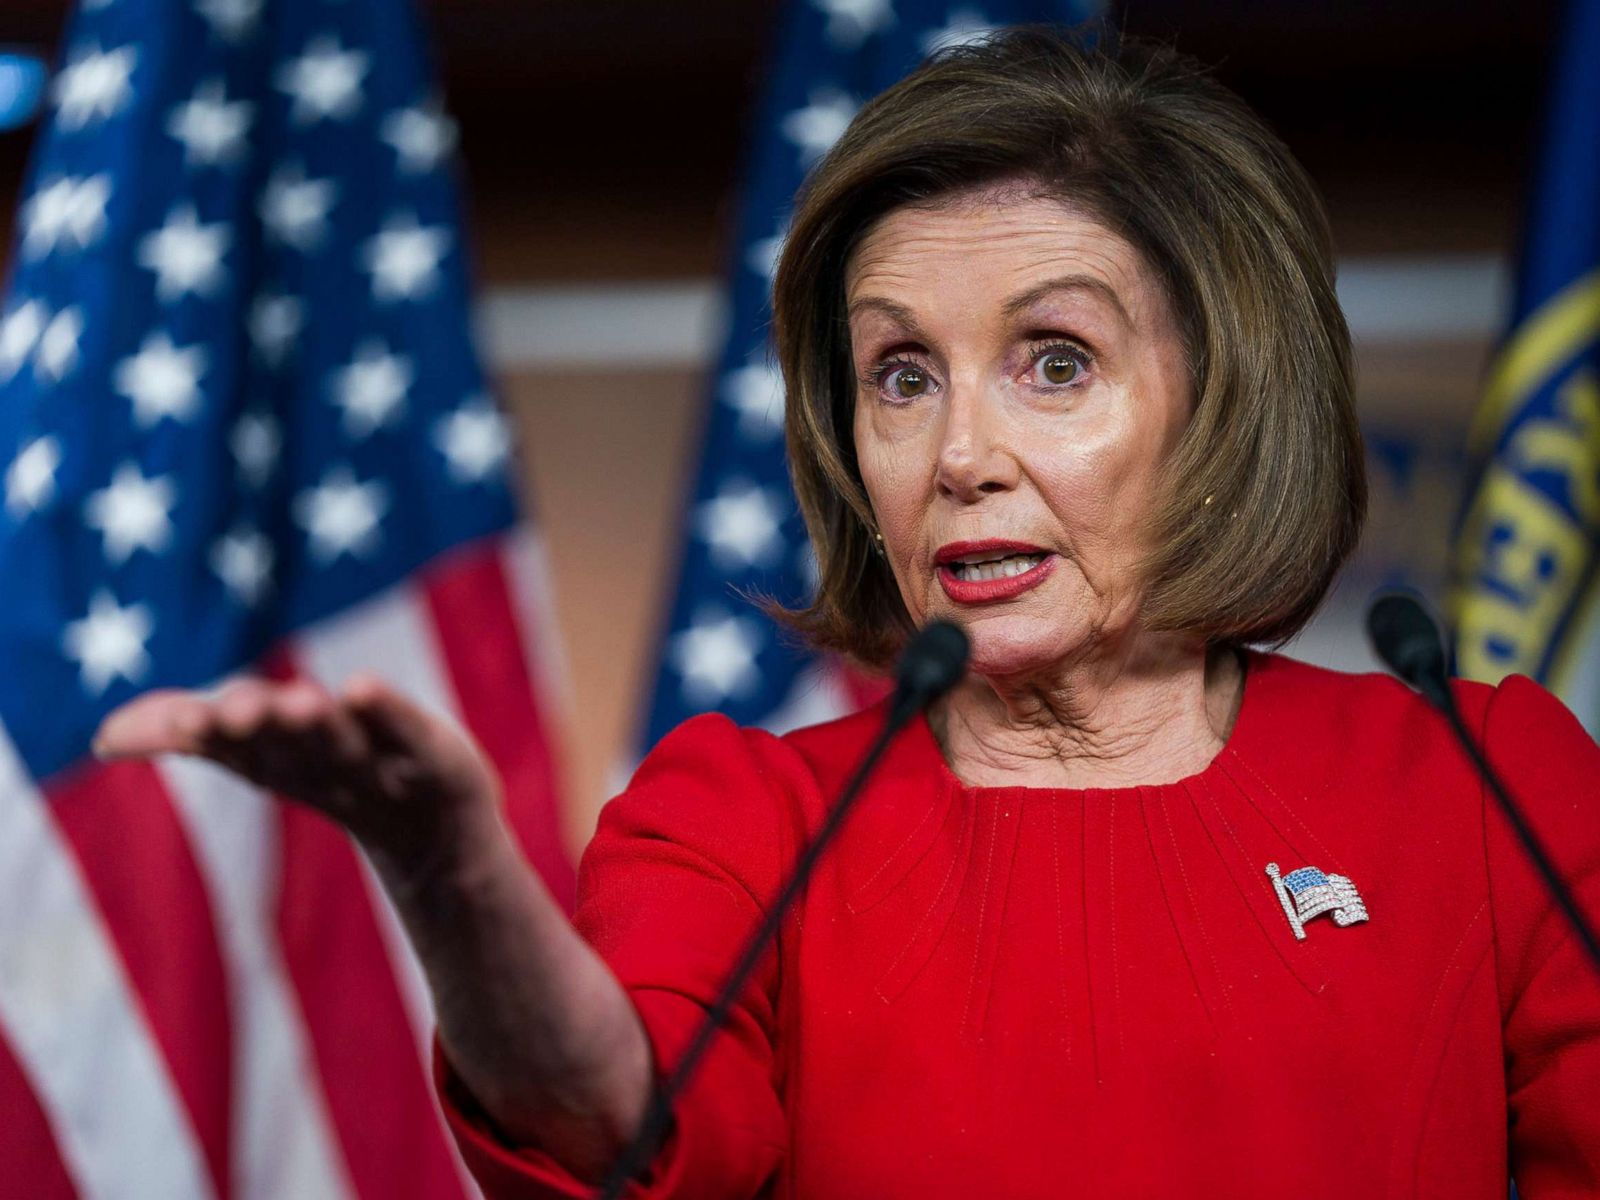 US Speaker says impeachment testimony shows 'bribery' case against Trump